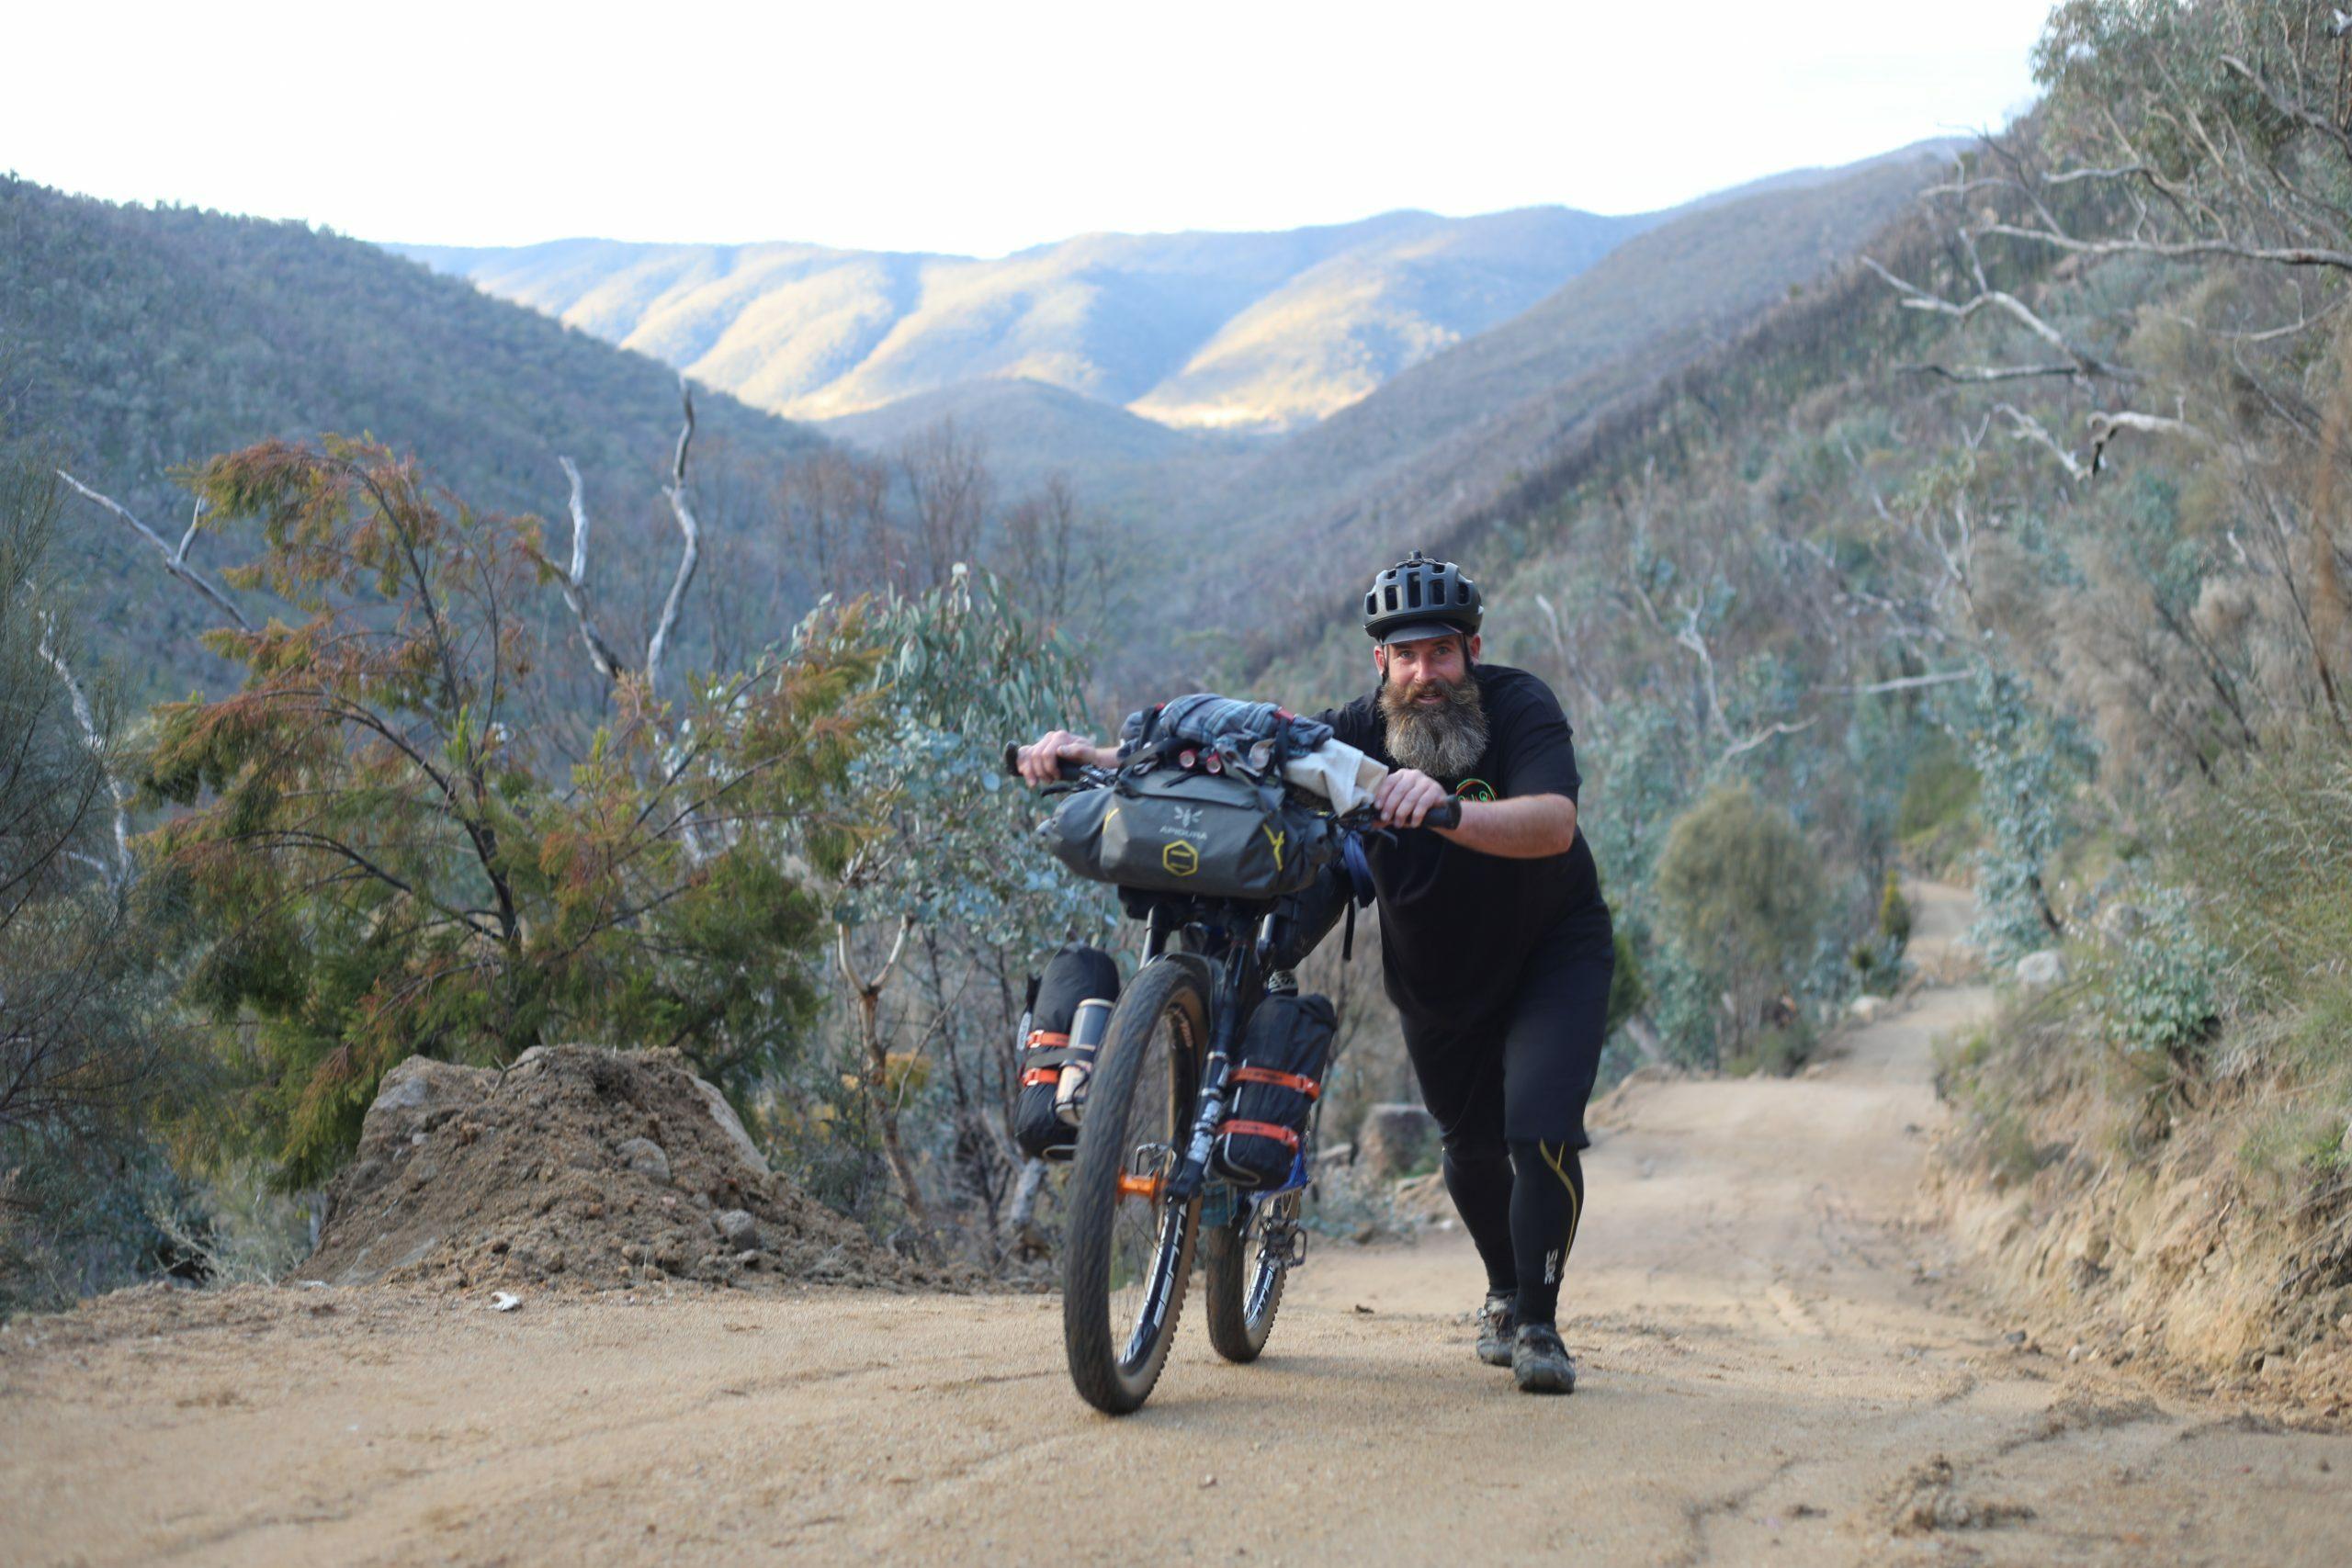 Hike a bike on the way up to Brandy Flat Hut